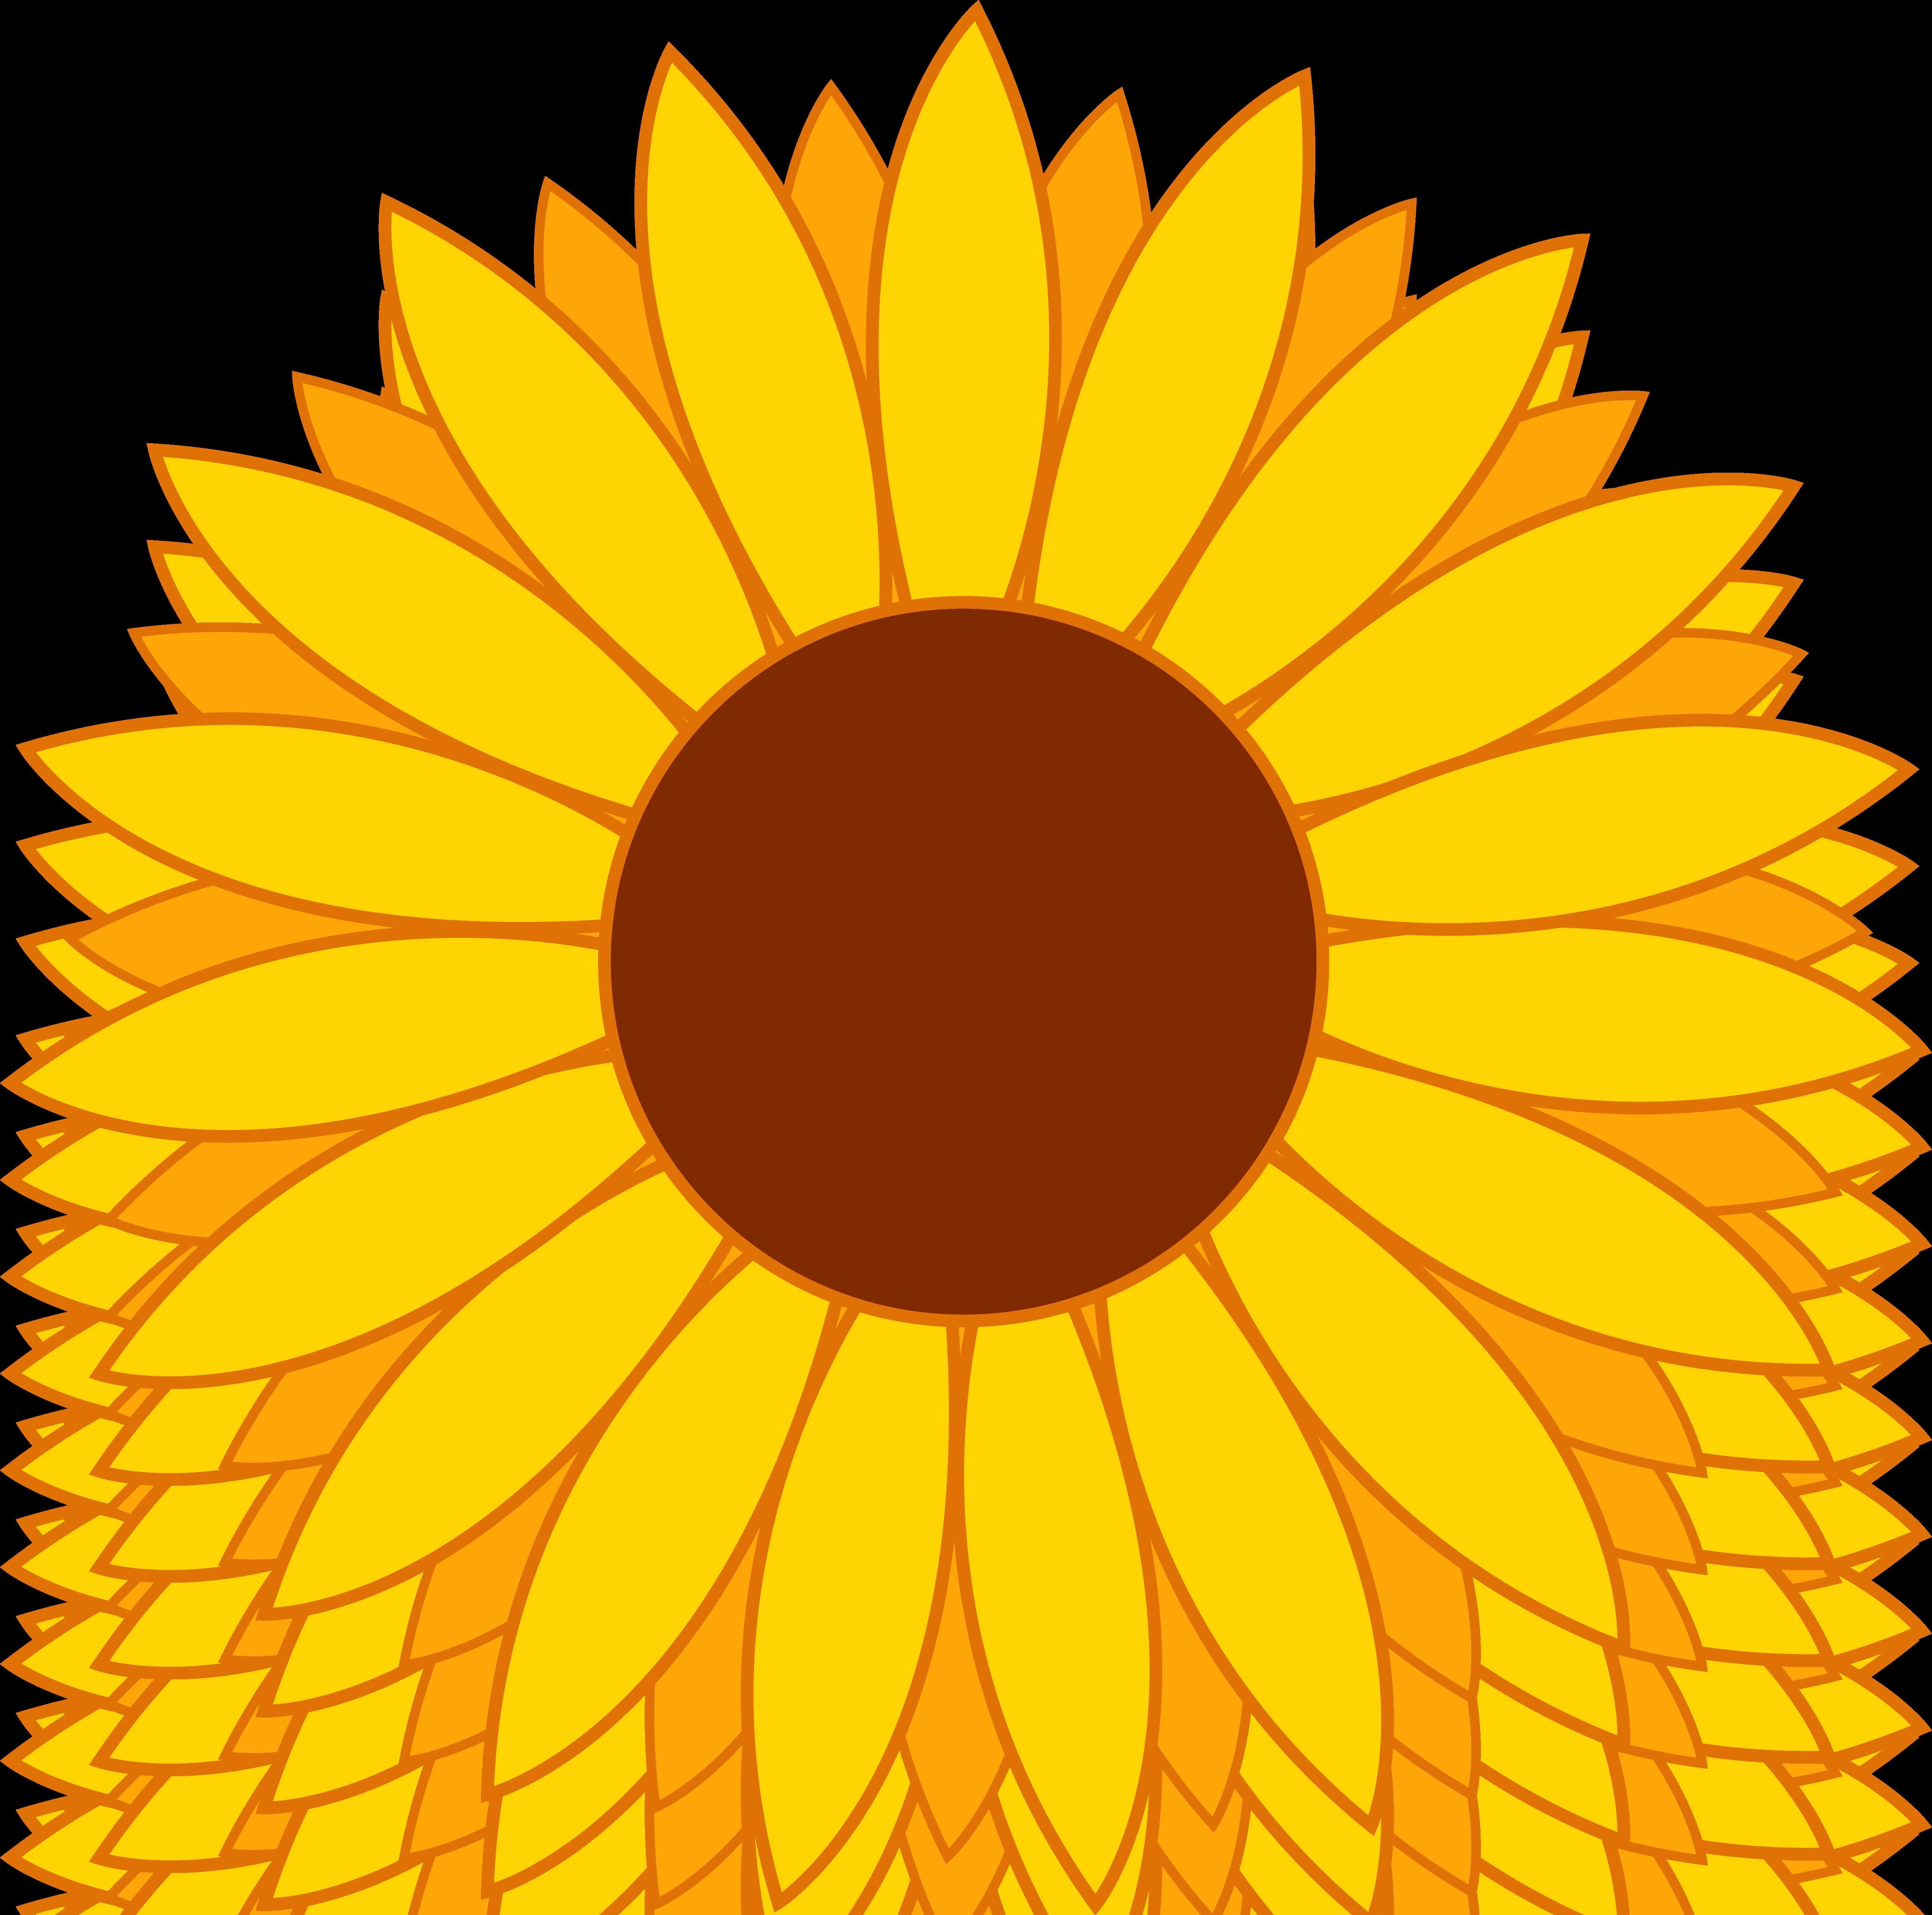 5110x5064 Simple Yellow Sunflower Design